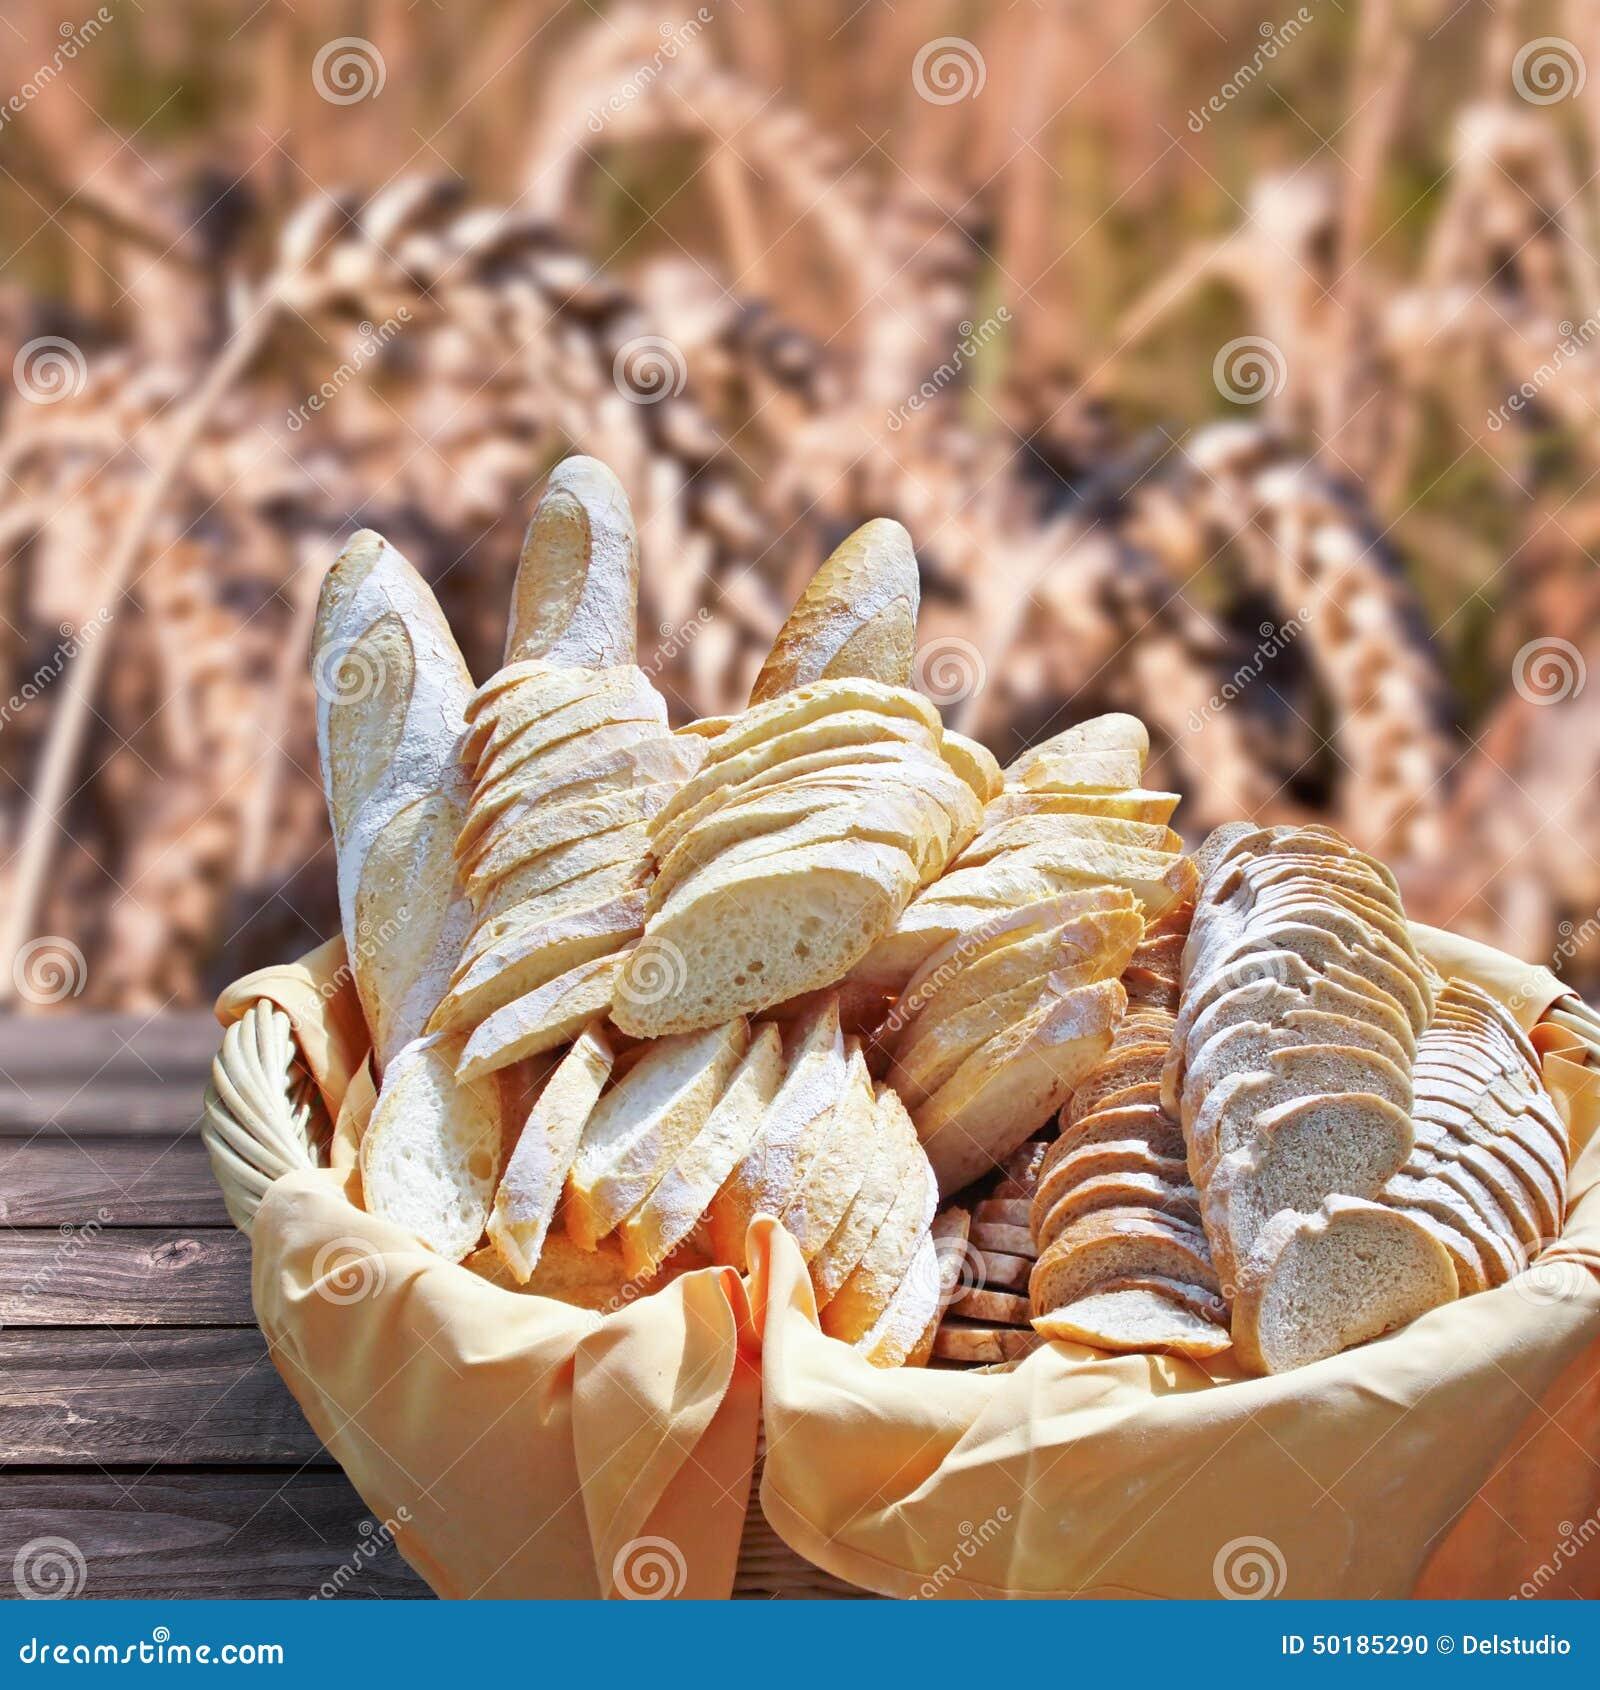 Basket of fresh bread,